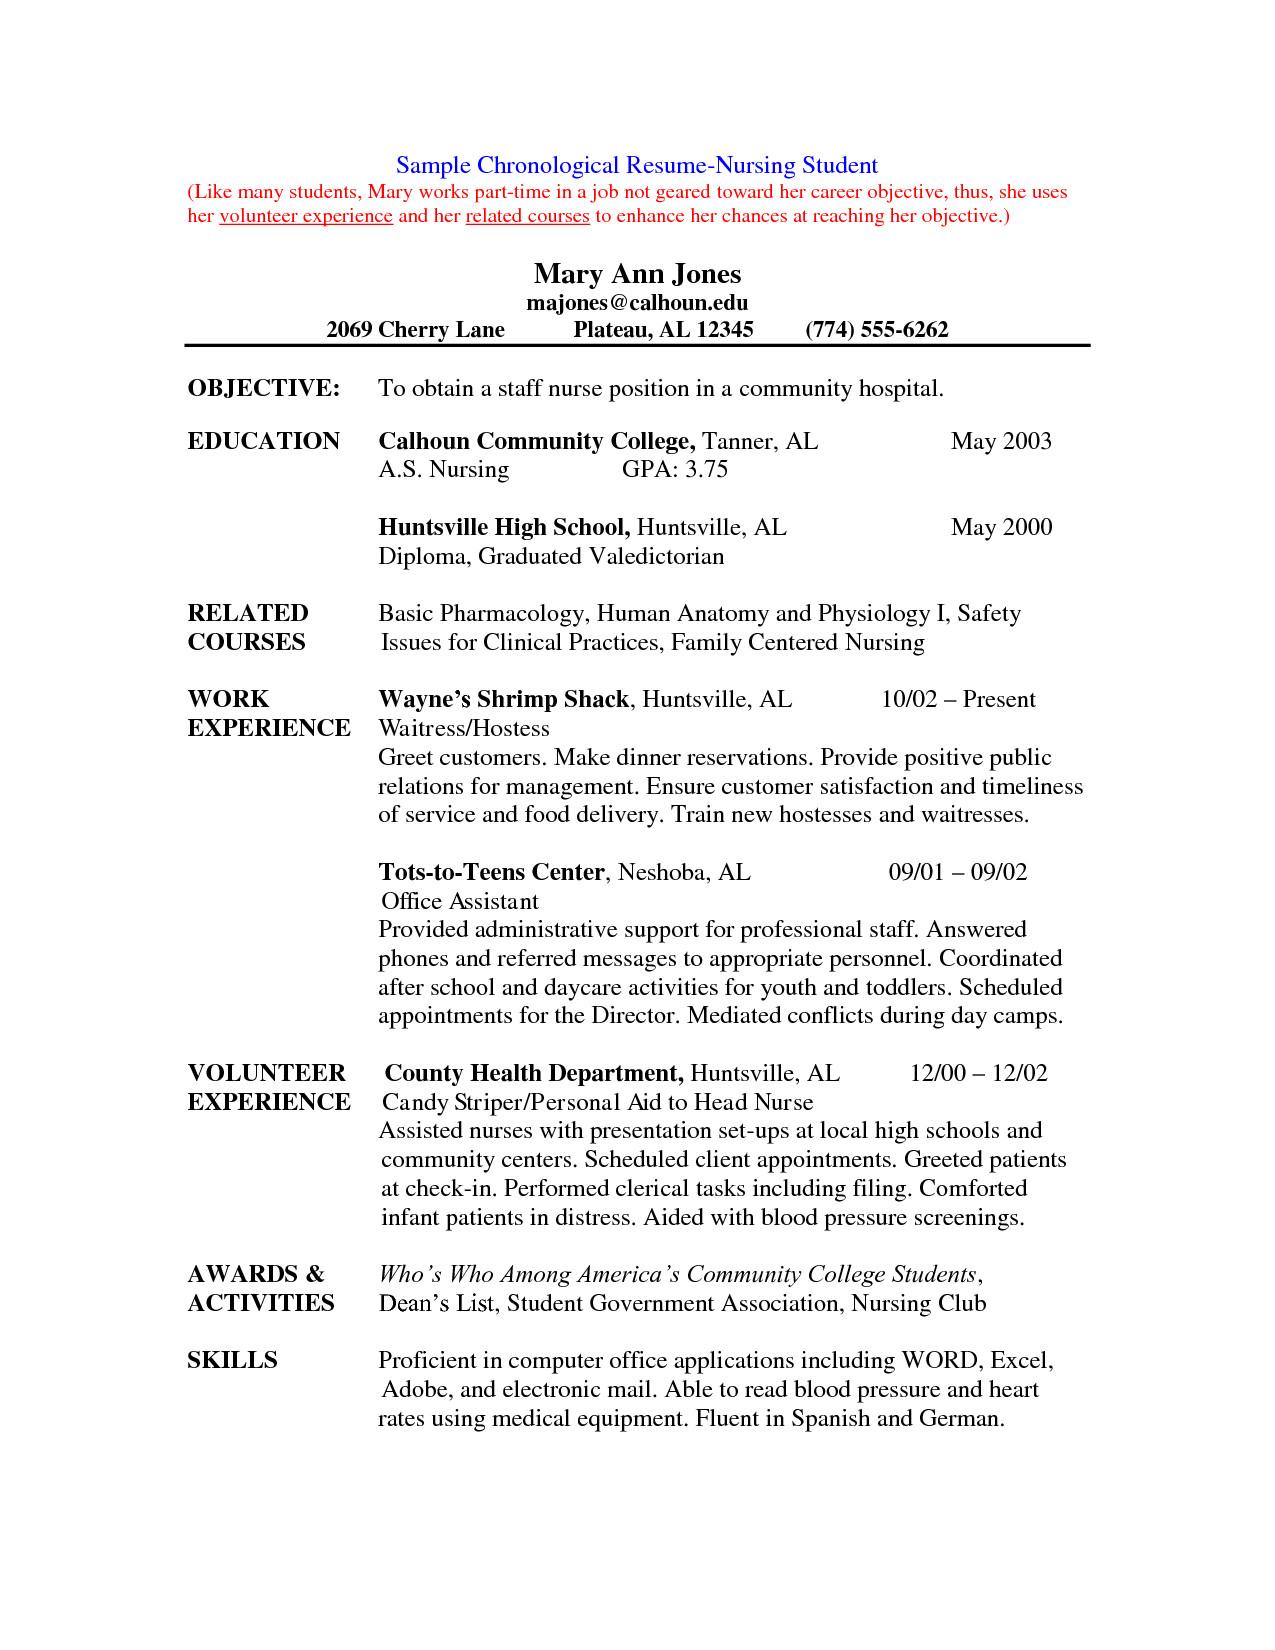 Sample Nursing Student Resume Cover Letters for Nursing Job Application Pdf